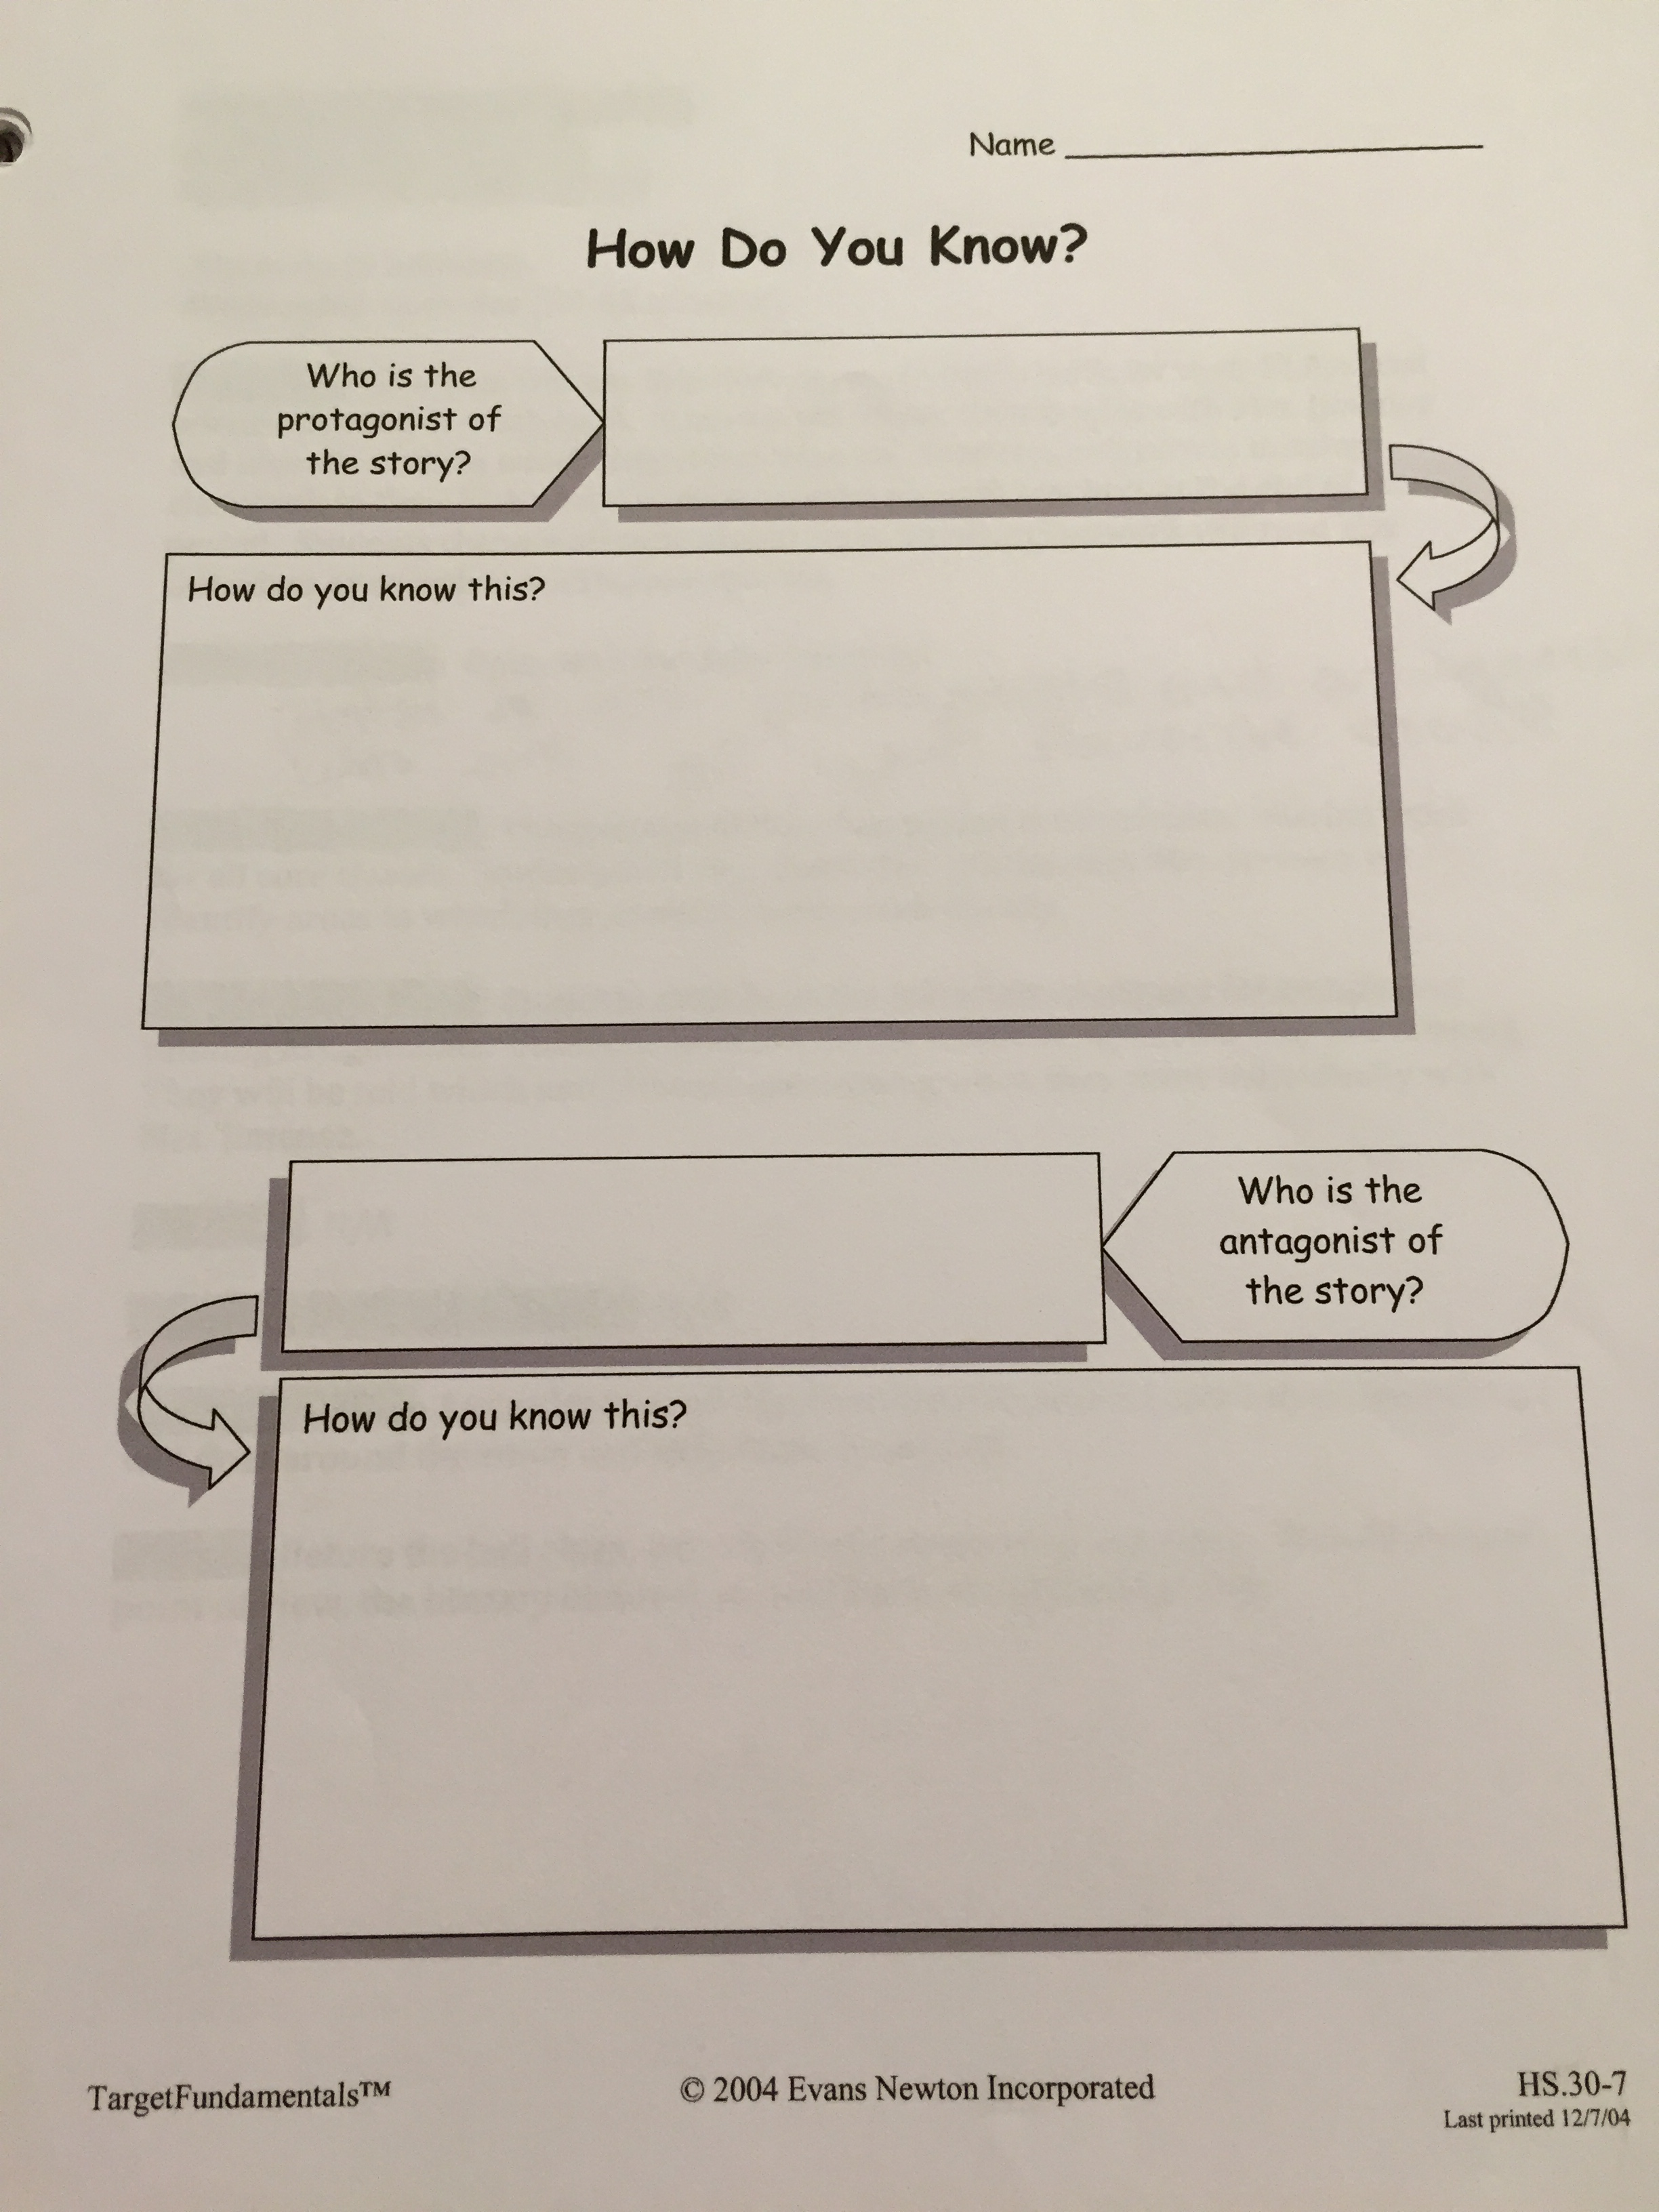 Worksheet Protagonist And Antagonist Worksheet Worksheet